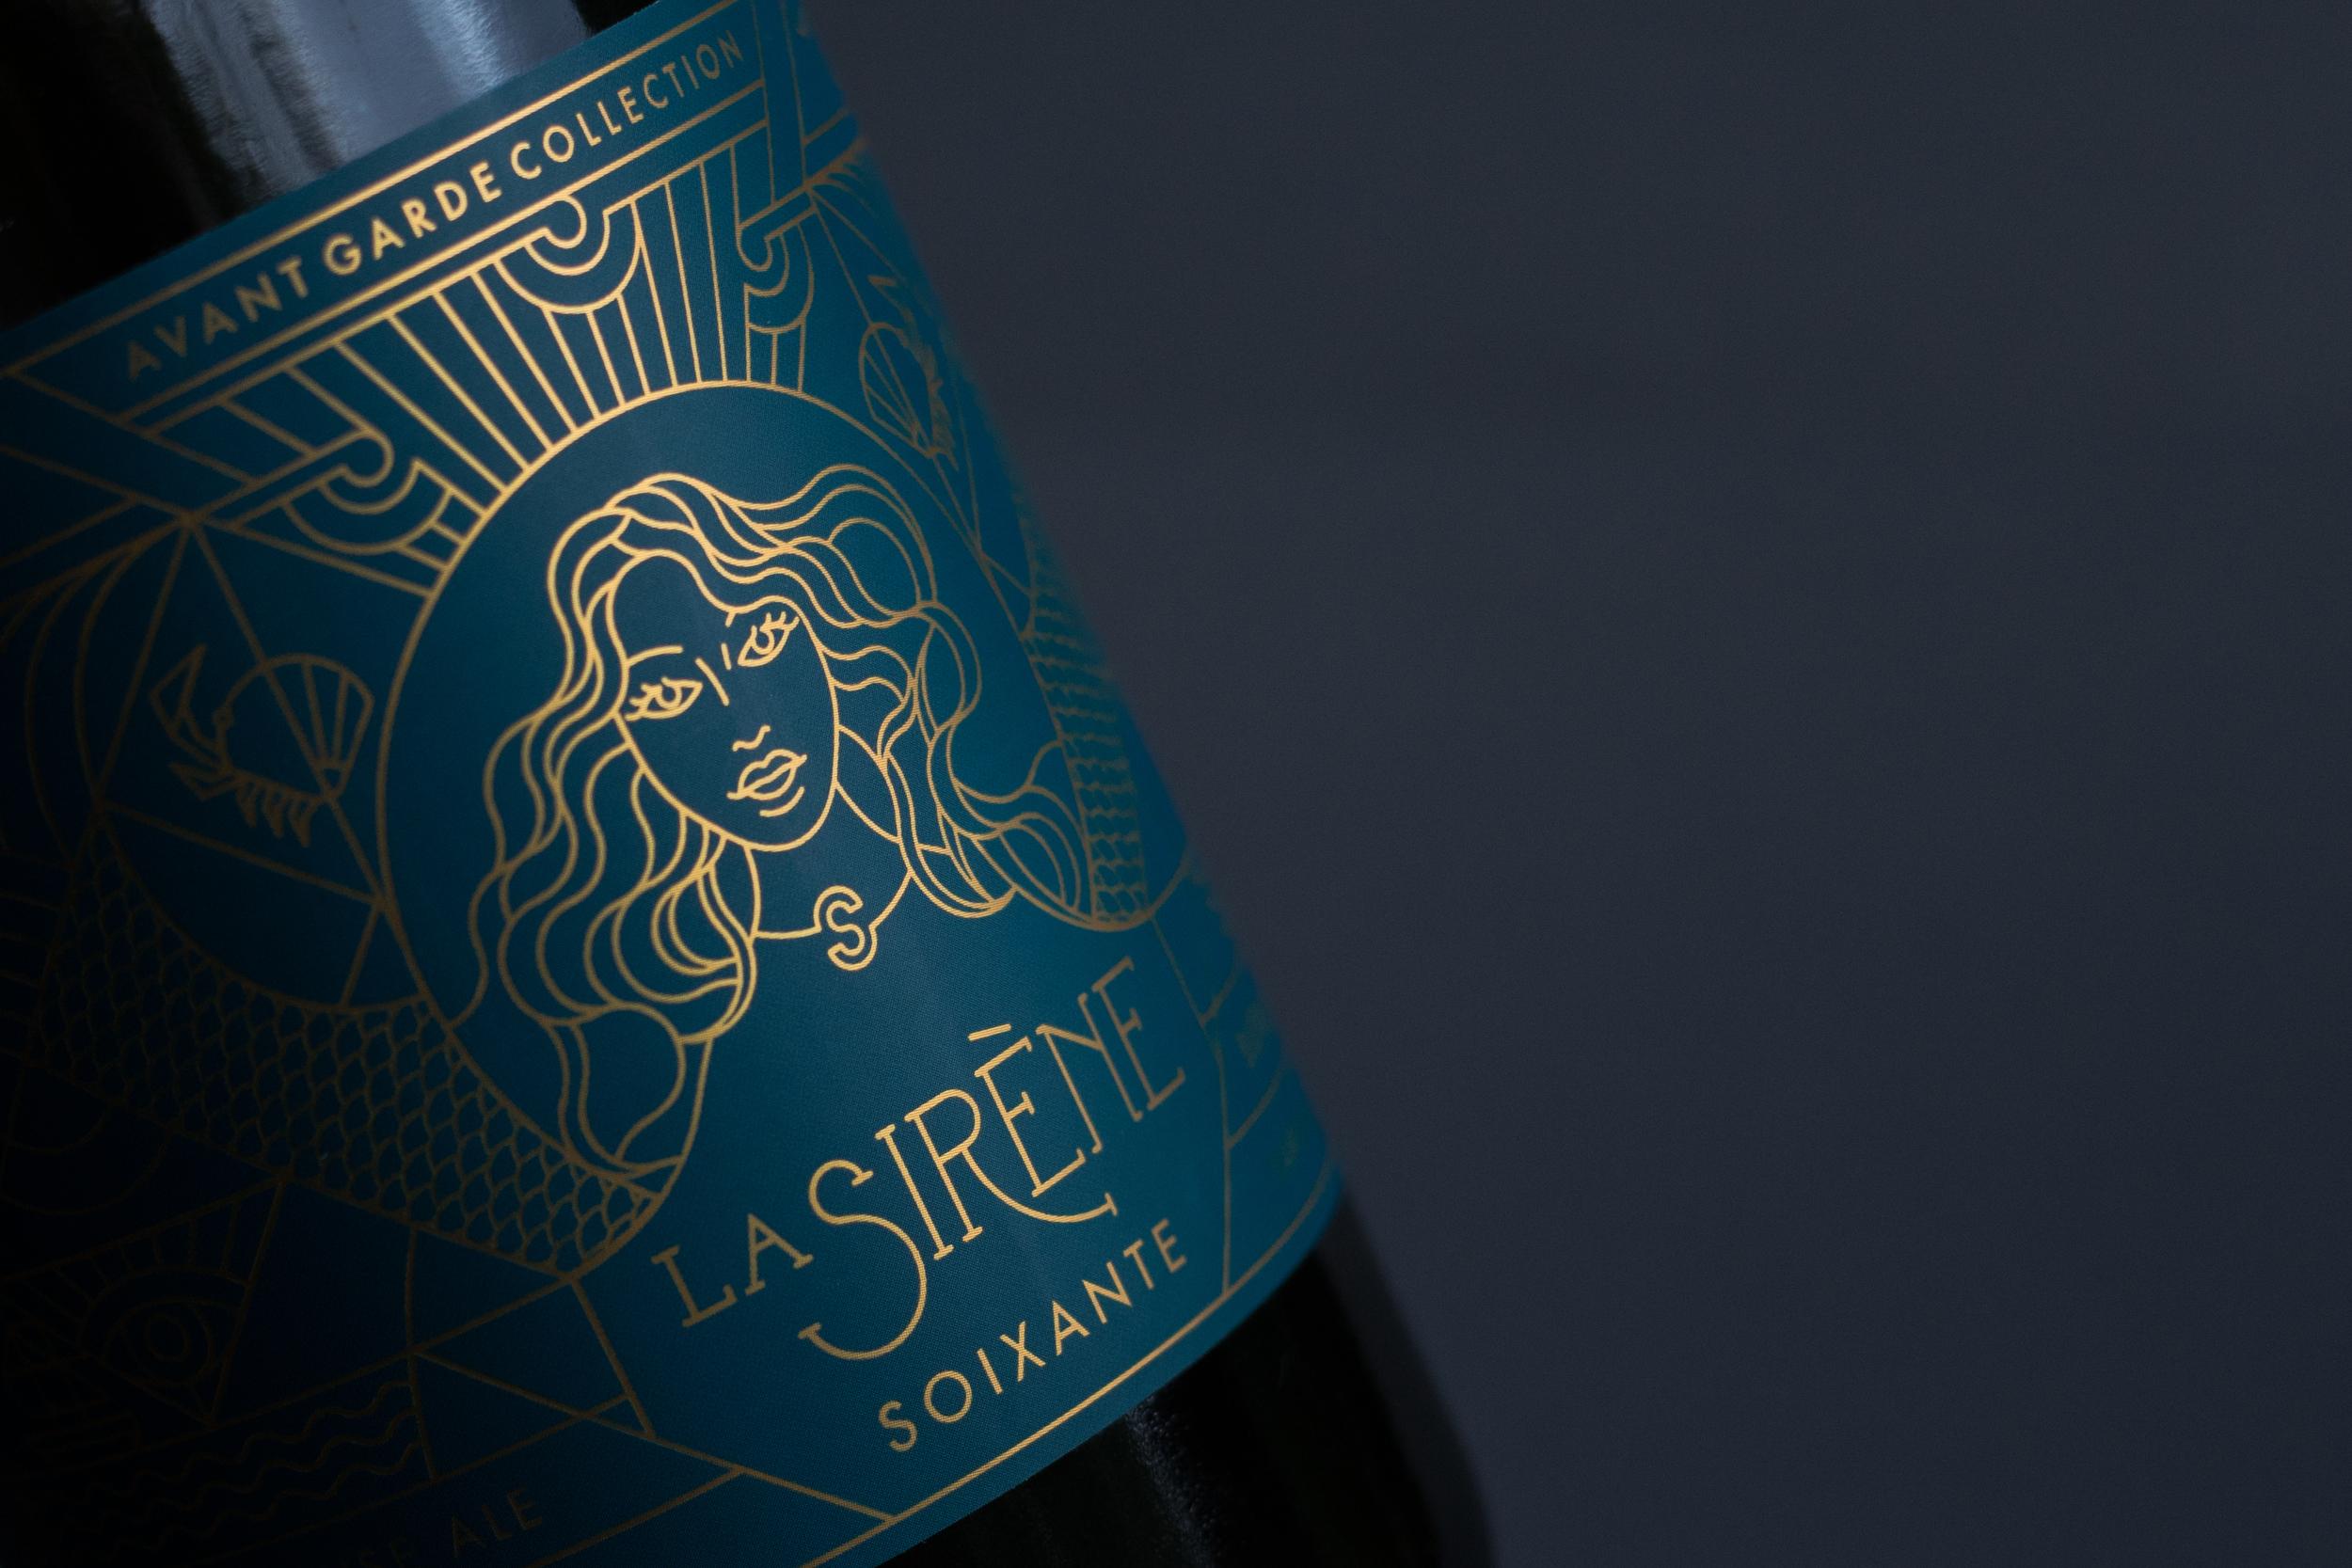 Soixante 6  % -  Farmhouse Ale - Mixed Fermentation - Earthy, Tart, Piquant